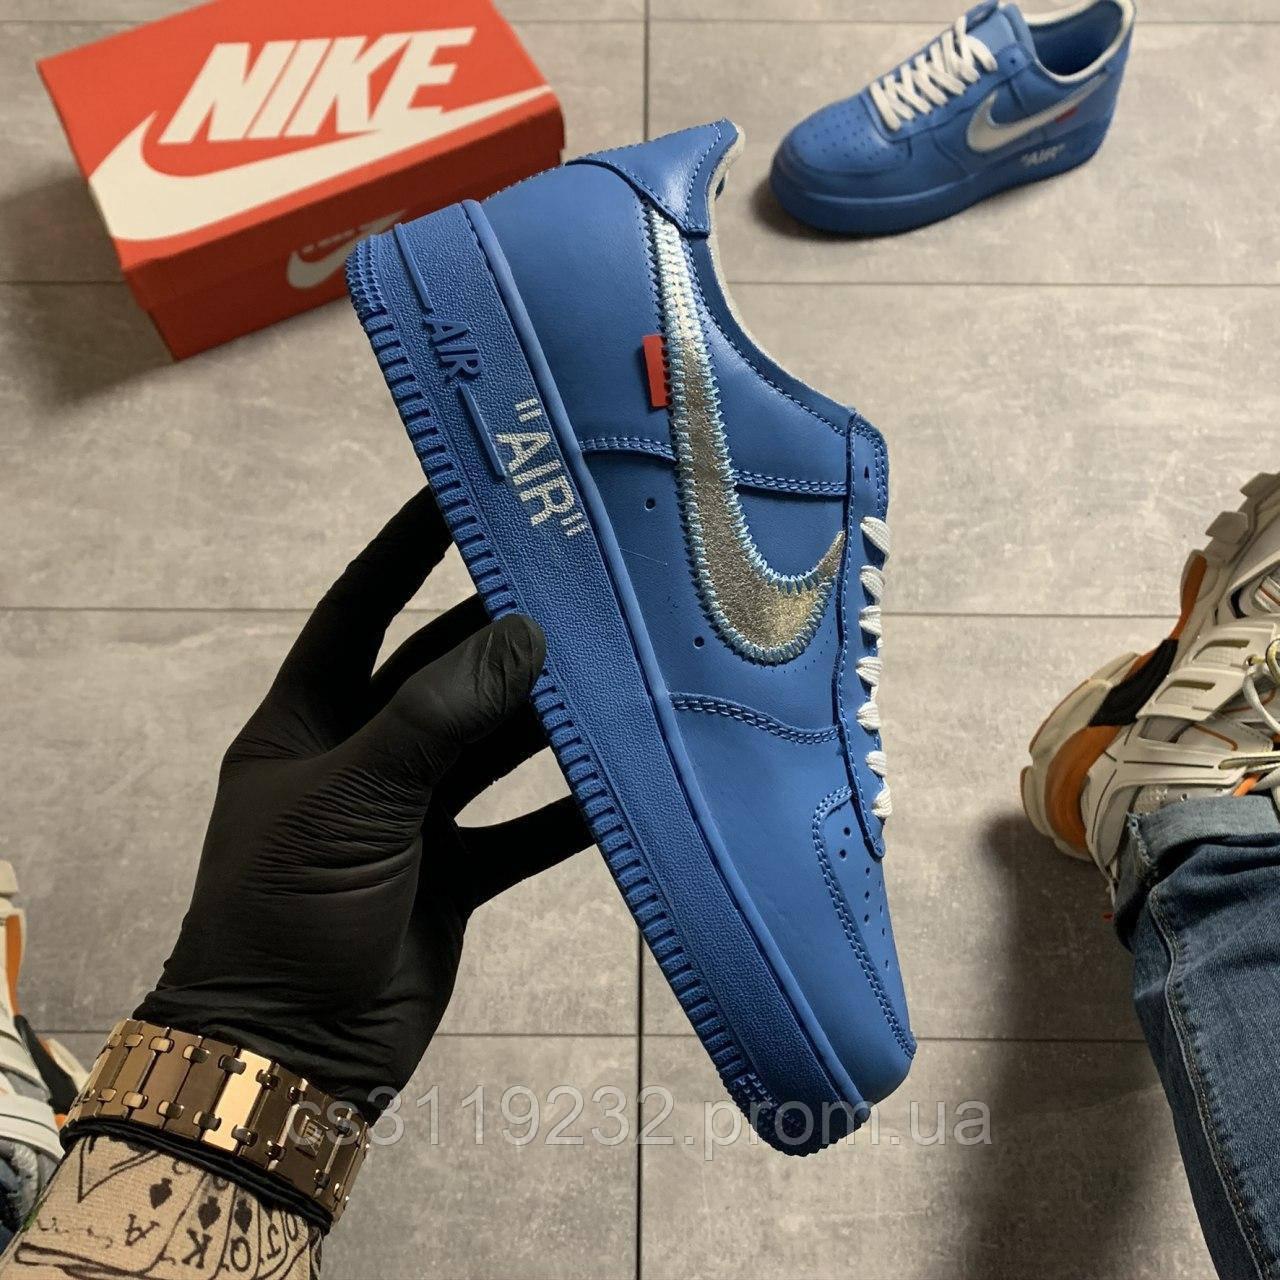 Мужские кроссовки Nike Air Force Low OFF-WHite Blue (голубые)